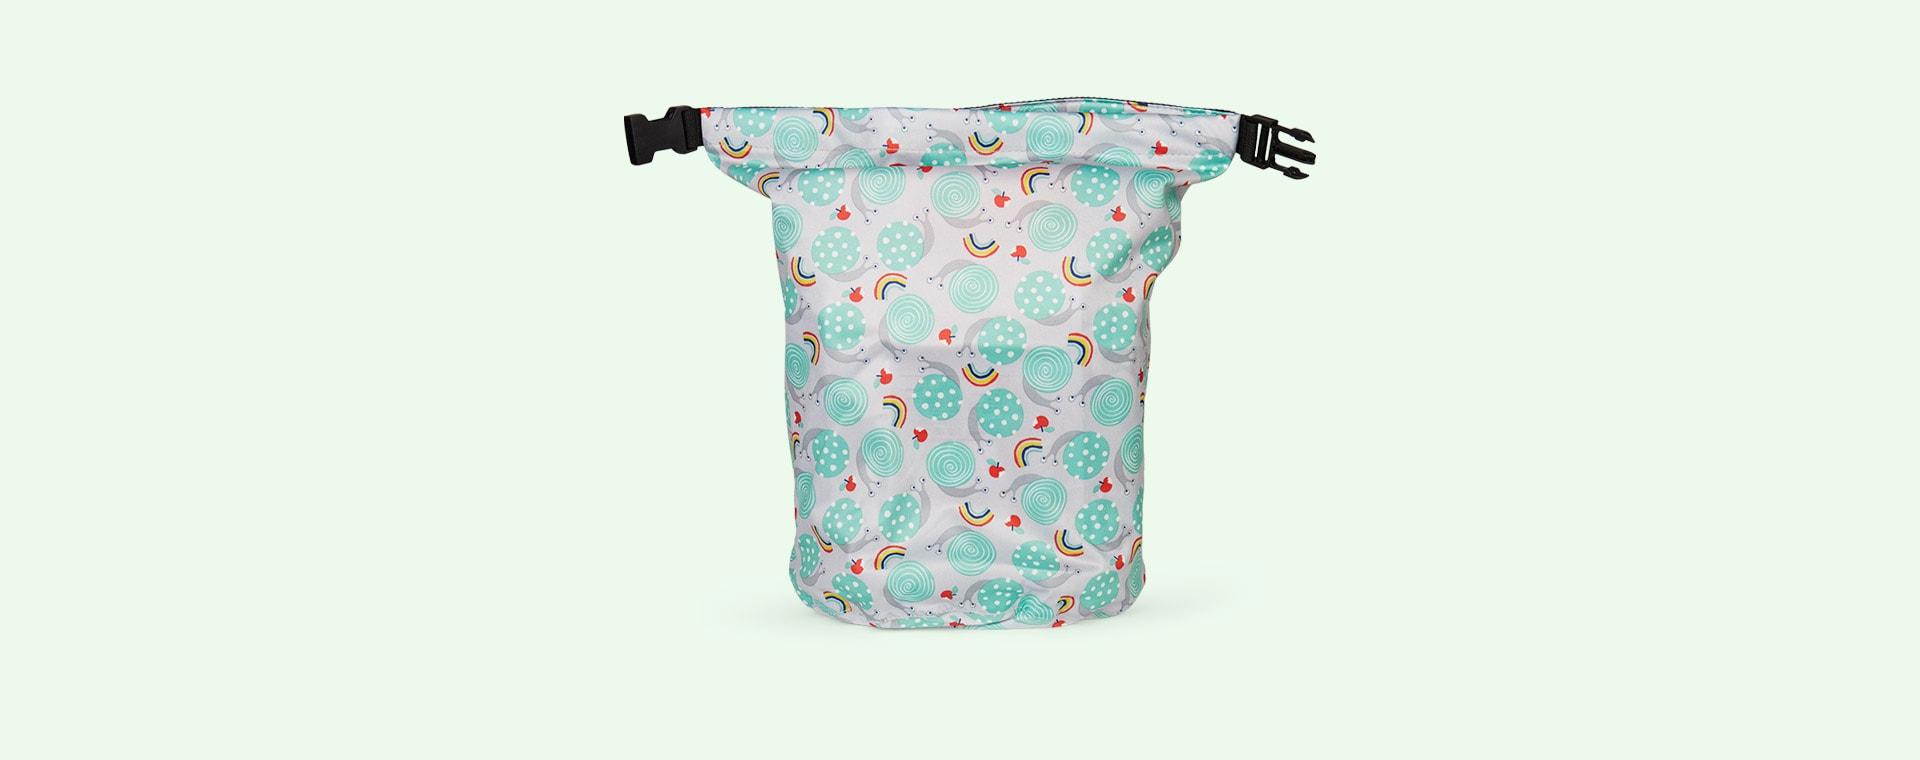 Snail Surprise Bambino Mio Wet Bag